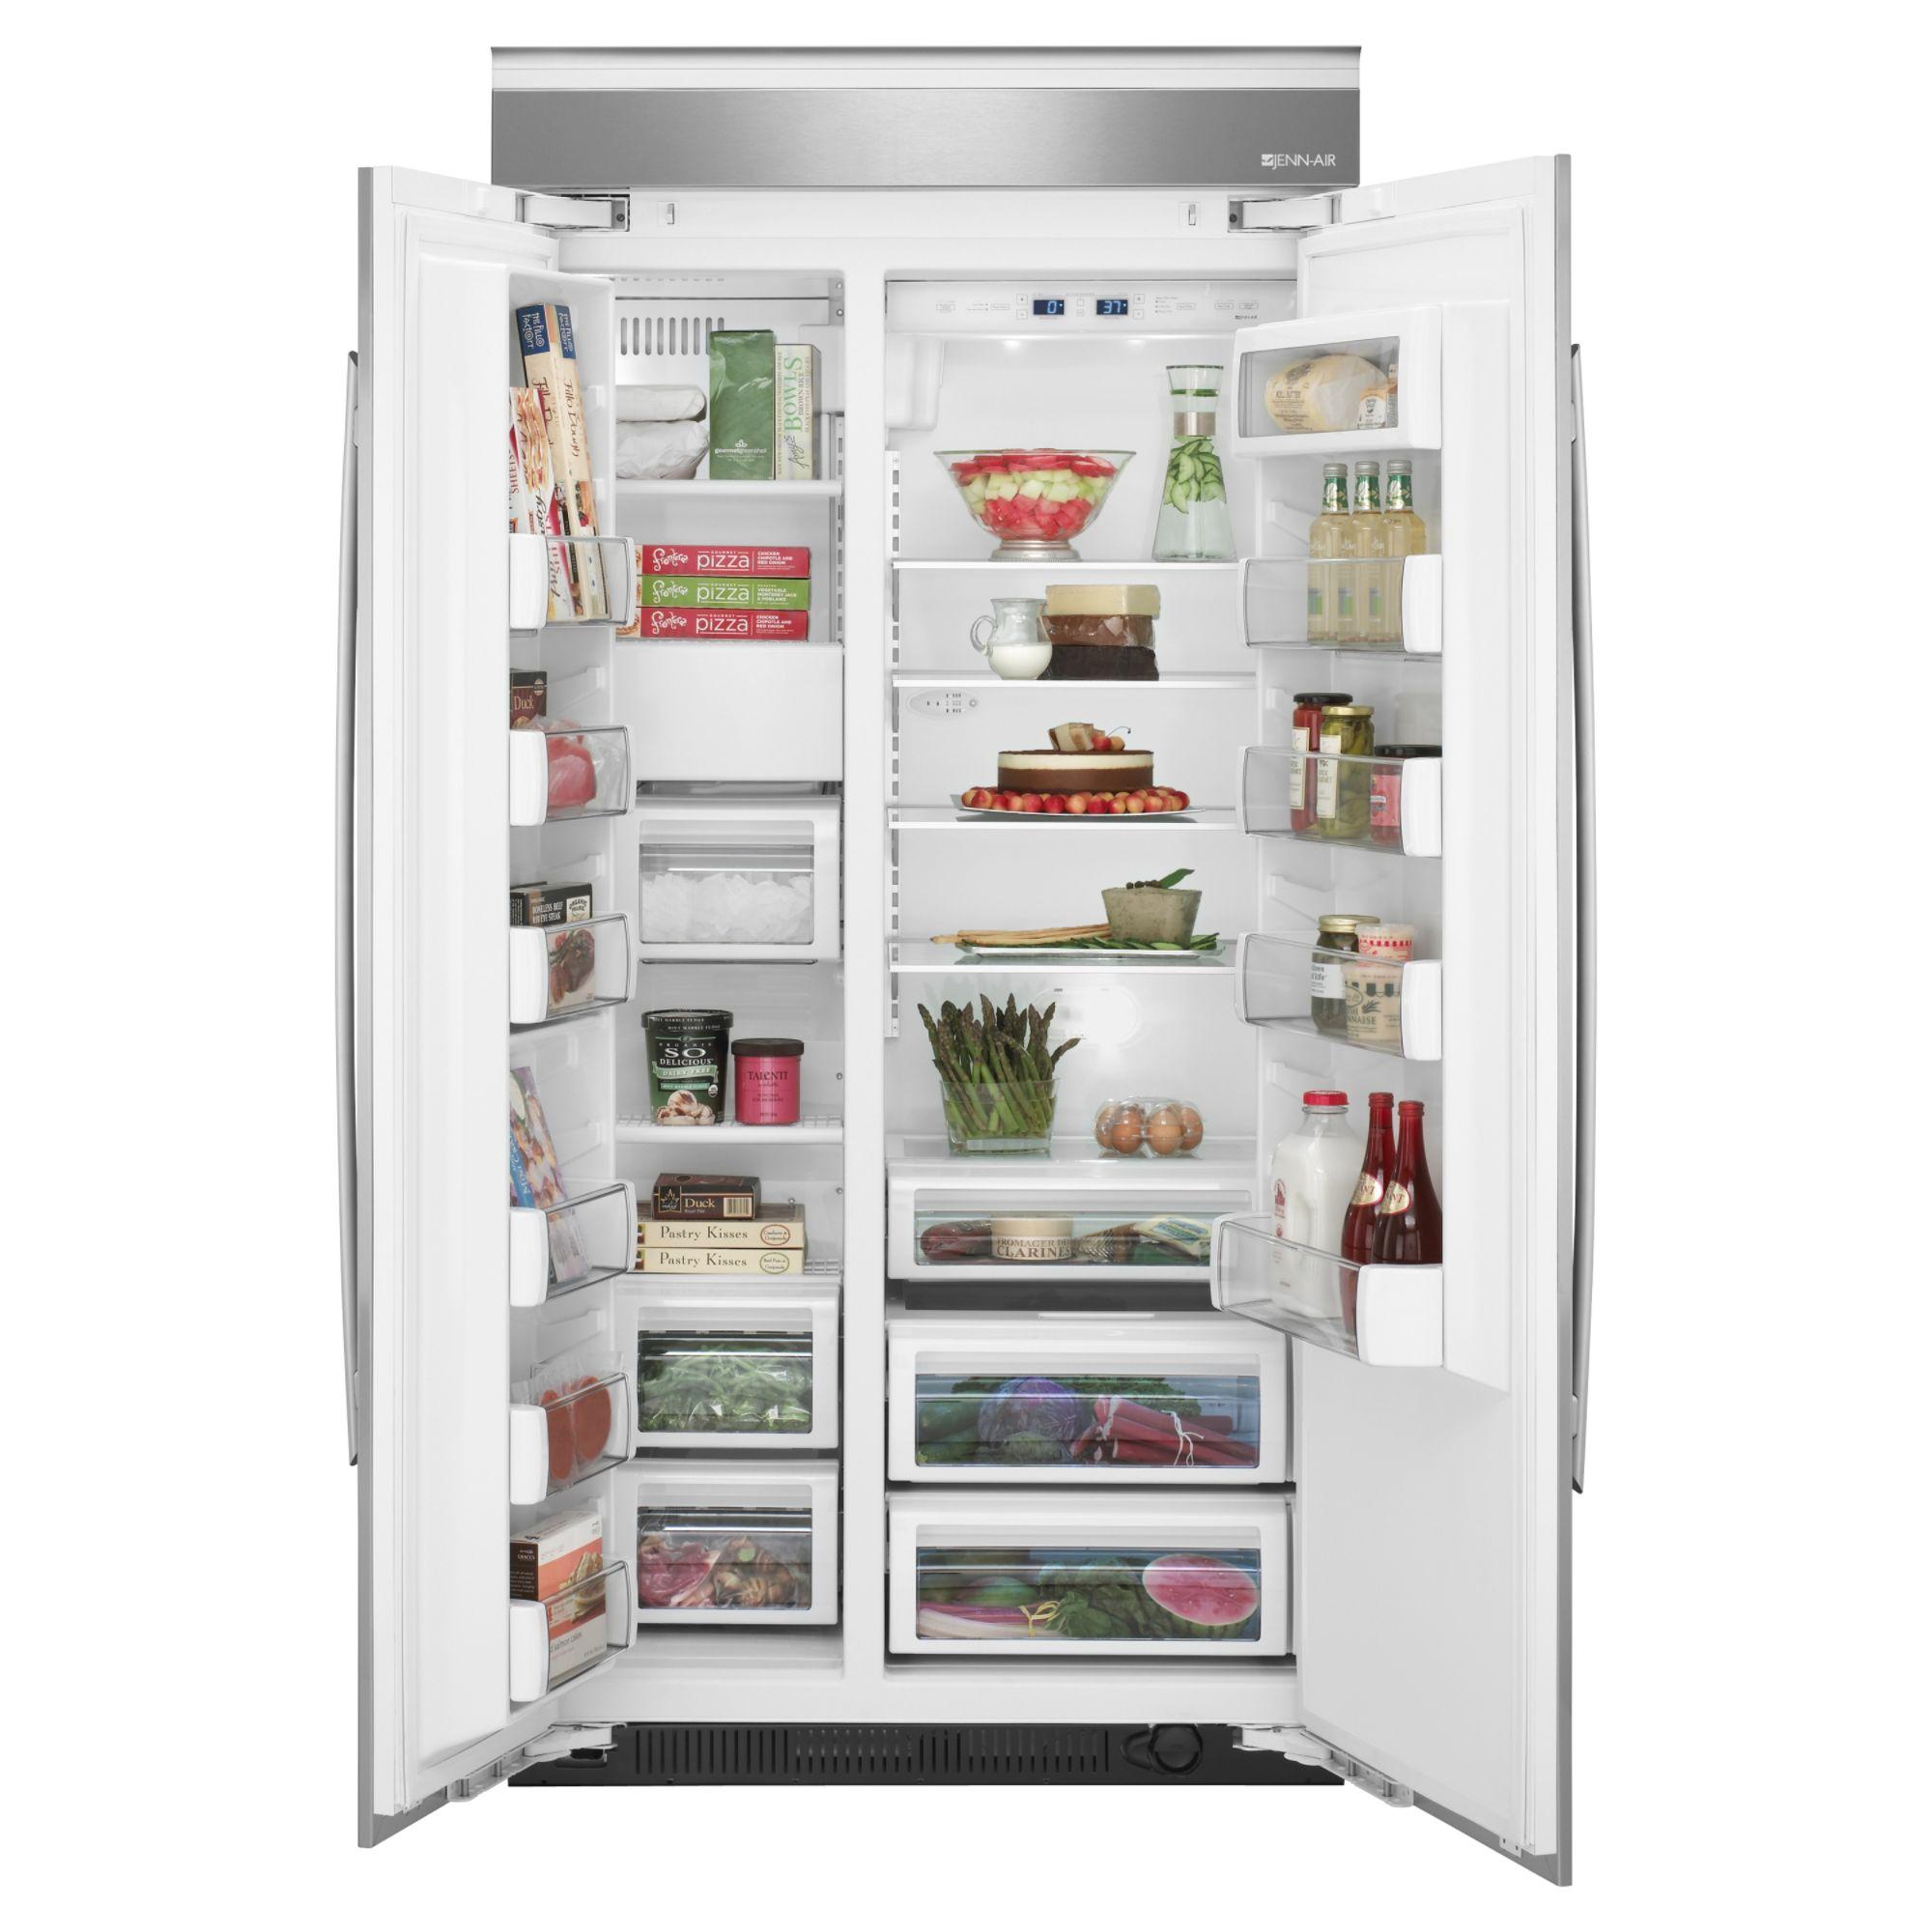 Jenn-Air 29.0 cu. ft. Built-In Side-By-Side Refrigerator